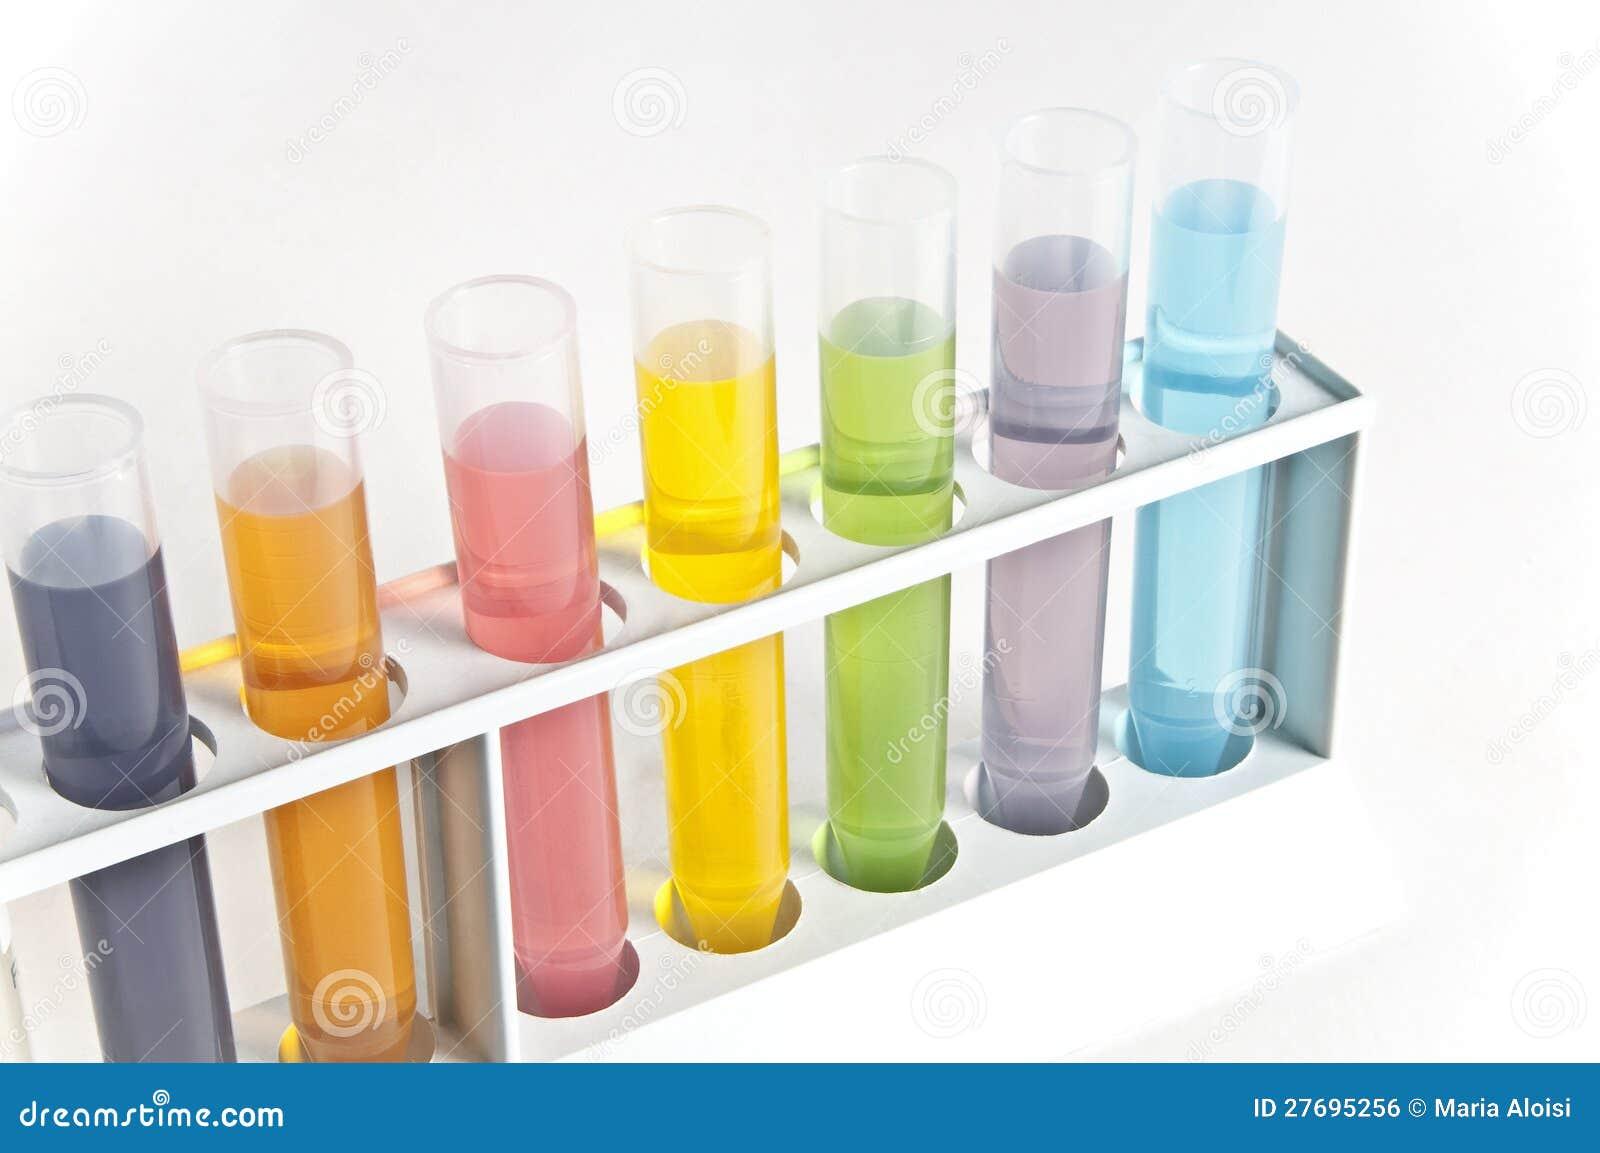 Chemistry Test Tubes Royalty Free Stock Image - Image ...